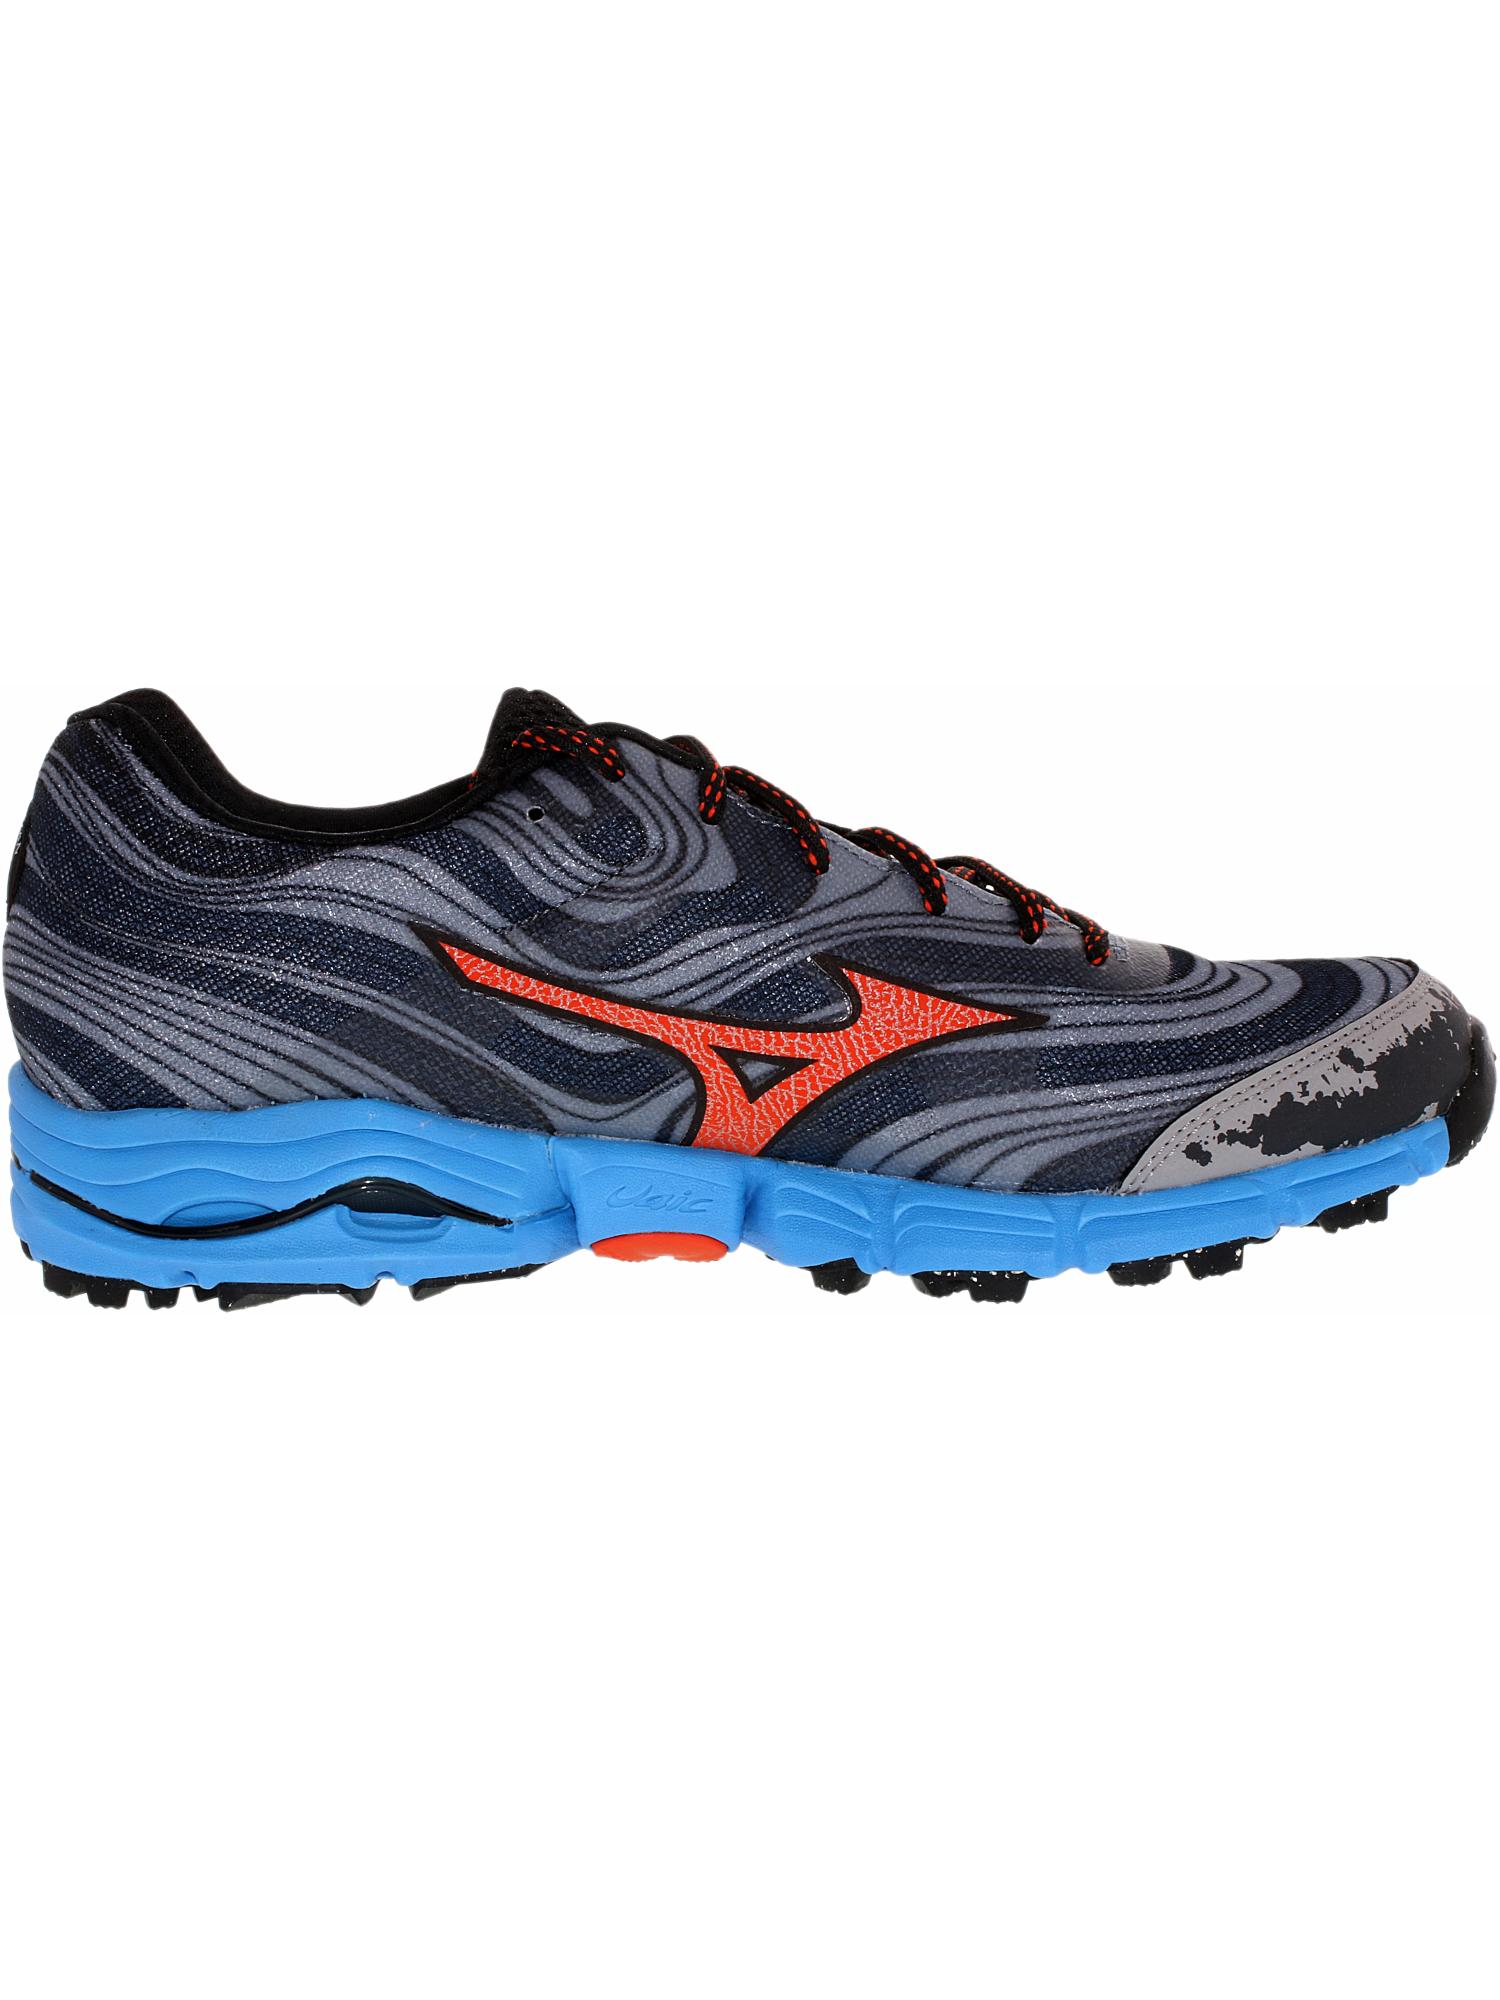 mens mizuno running shoes size 9.5 europe high tension basse